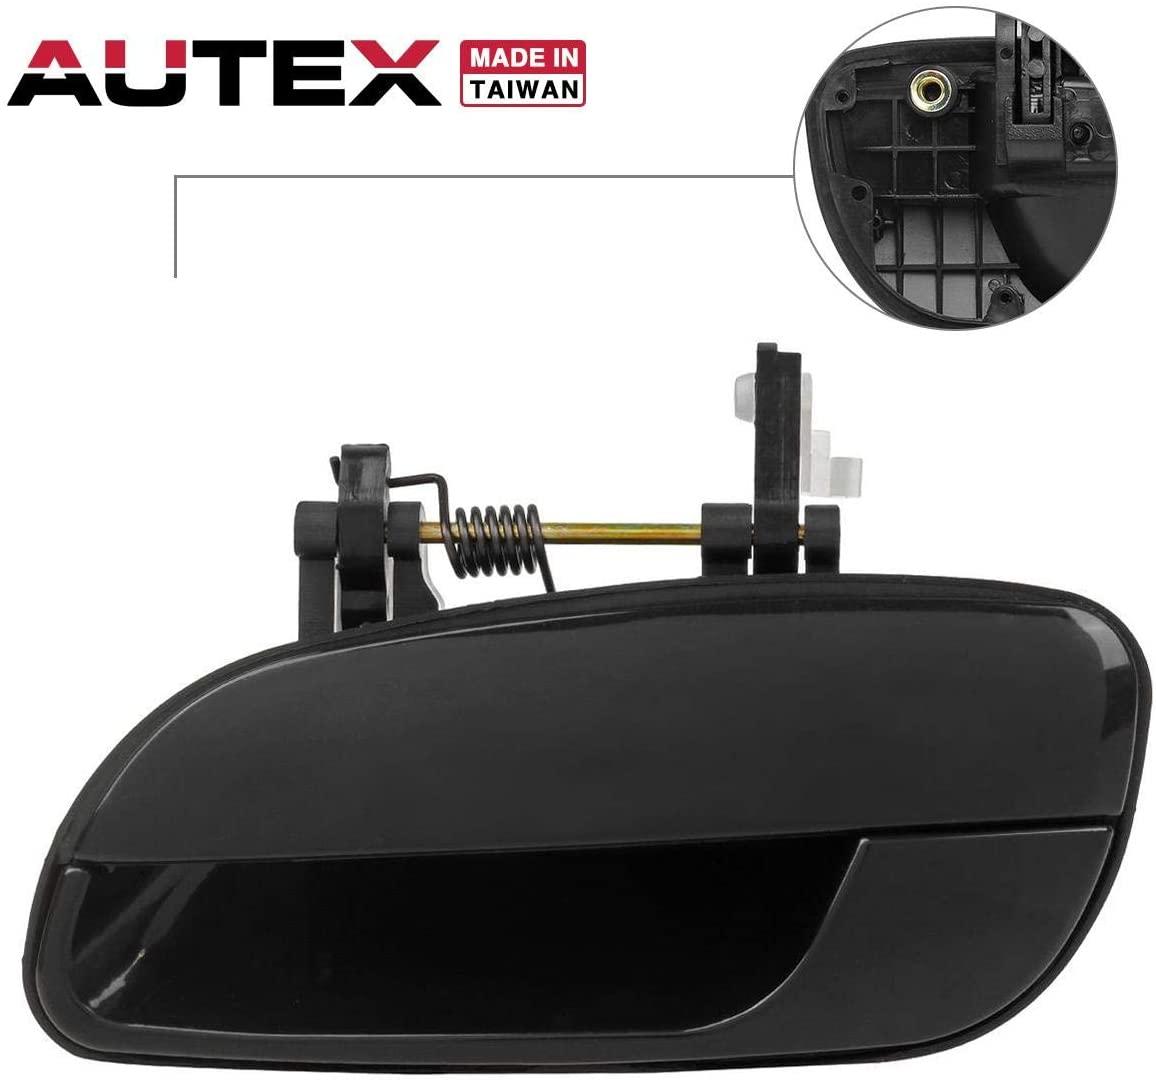 AUTEX Door Handle Black Exterior Rear Left Driver Side Compatible with Elantra 2001 2002 2003 2004 2005 Door Handle 80690 836502D000 83650-2D000 HY1520102